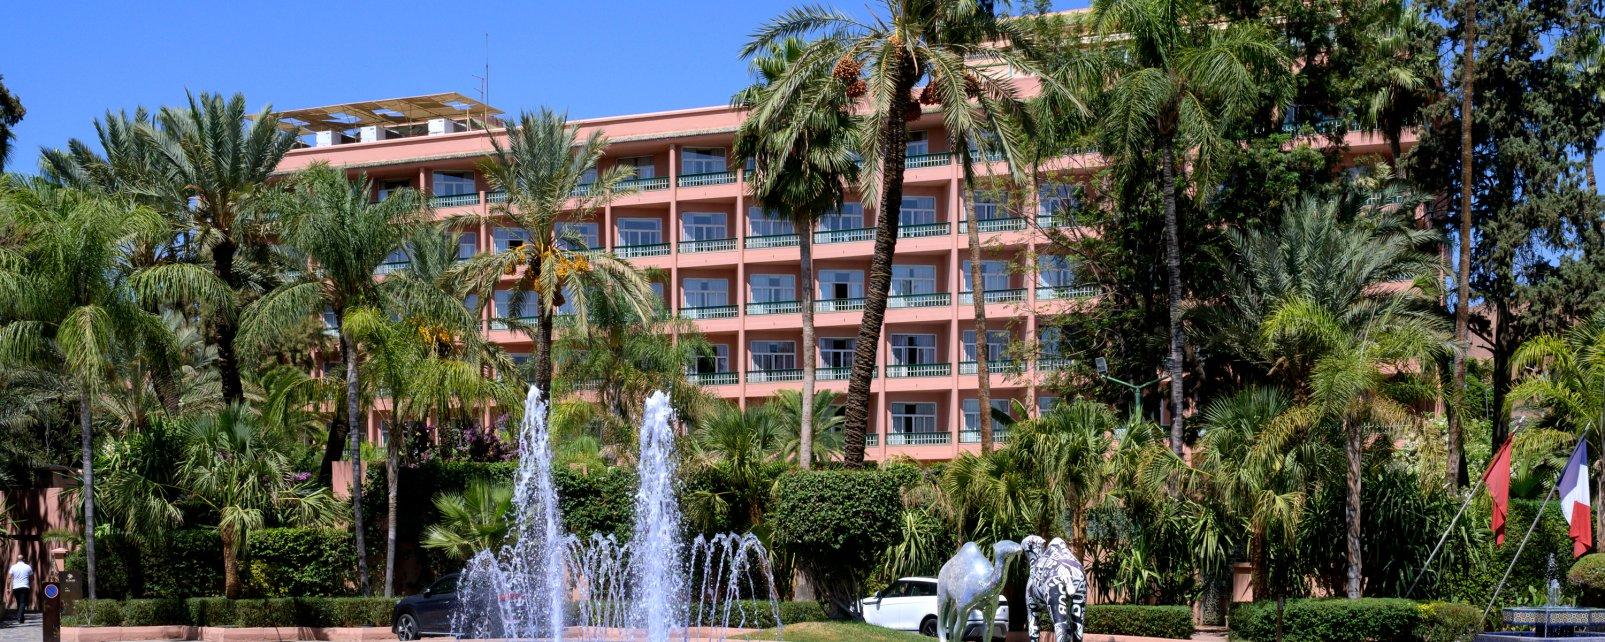 Hotel Es Saadi Garden Resort